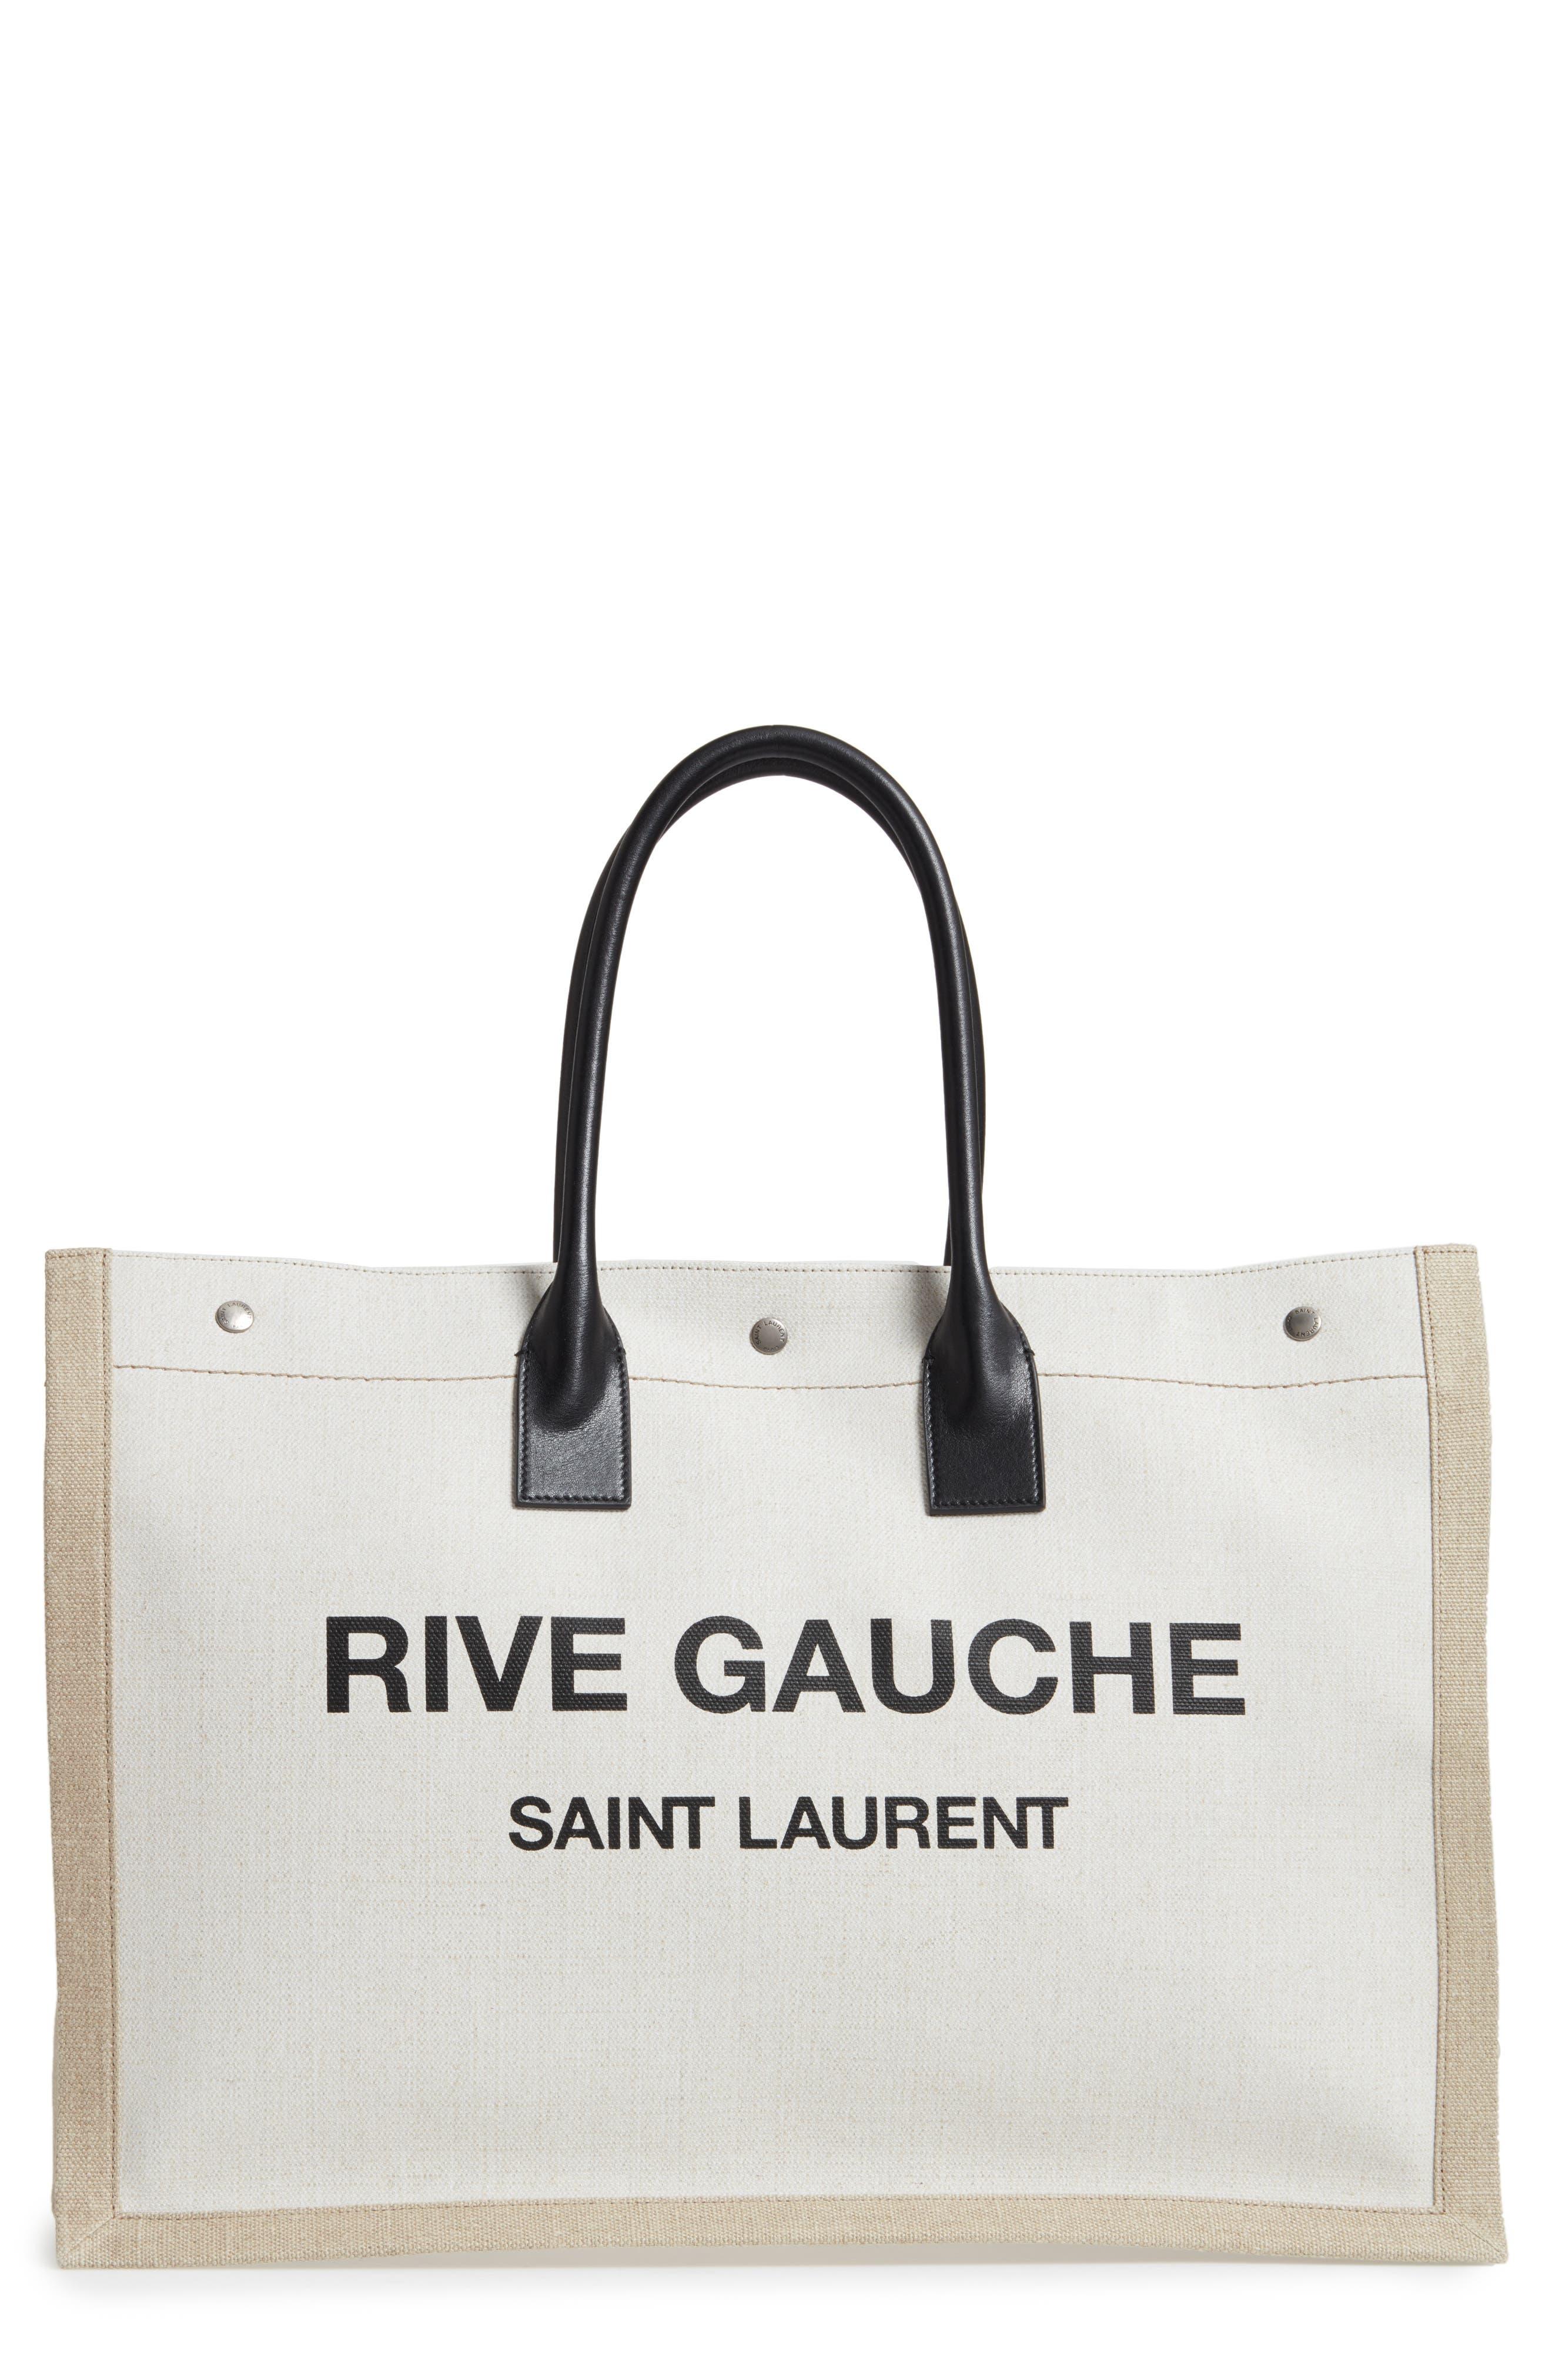 Saint Laurent Noe Rive Gauche Logo Linen Tote